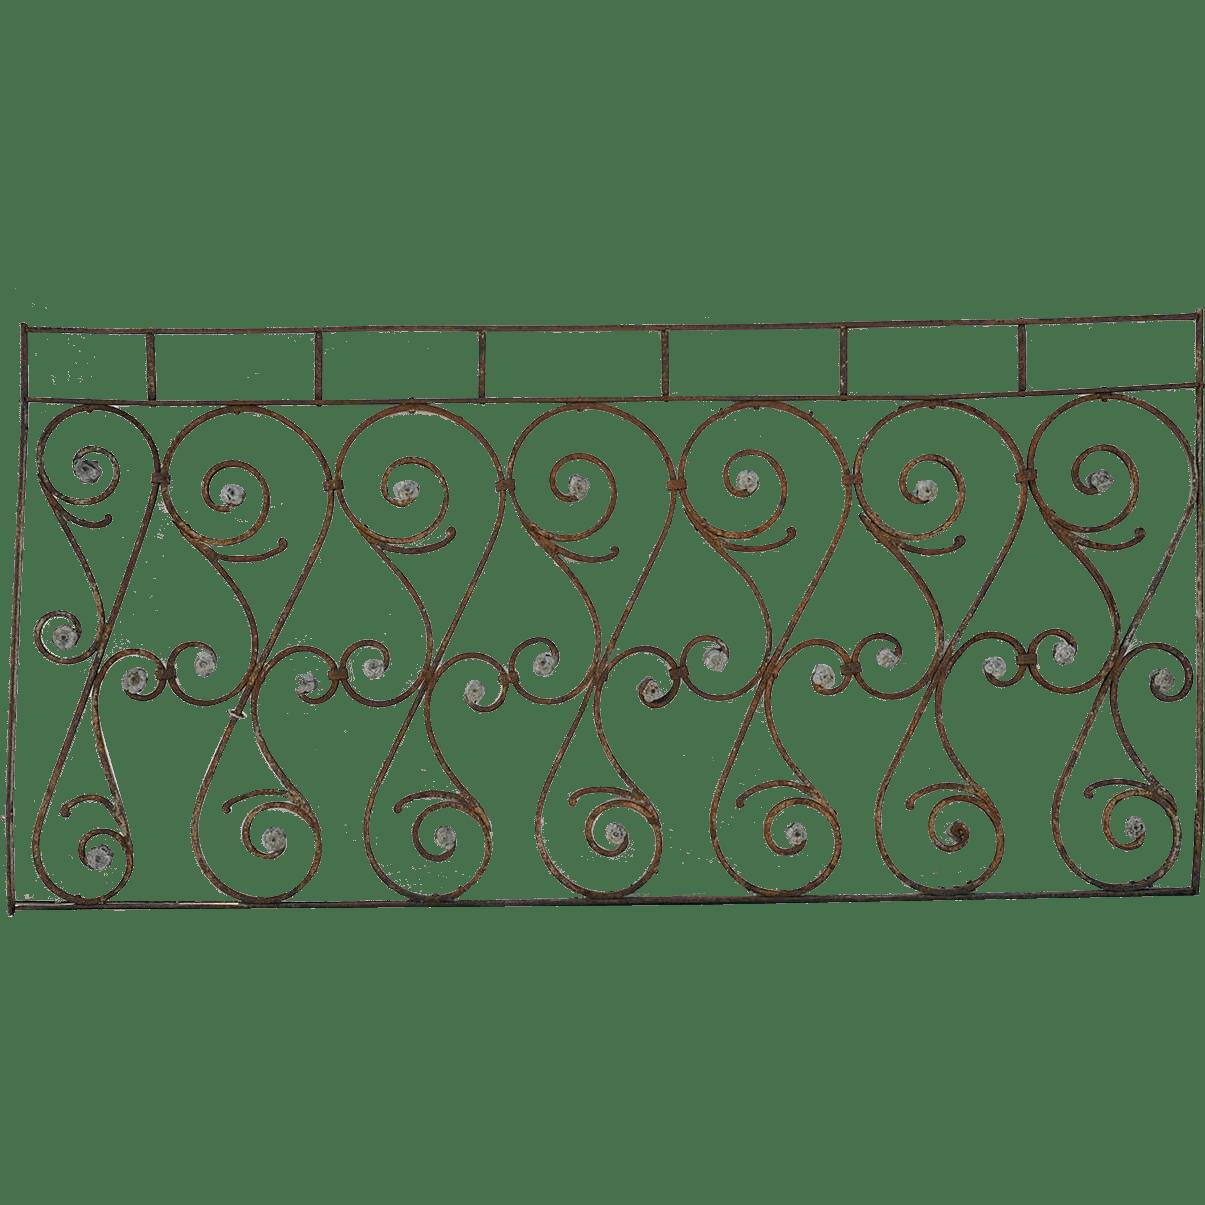 French 19th Century Wrought Iron Balcony Railing : Eron